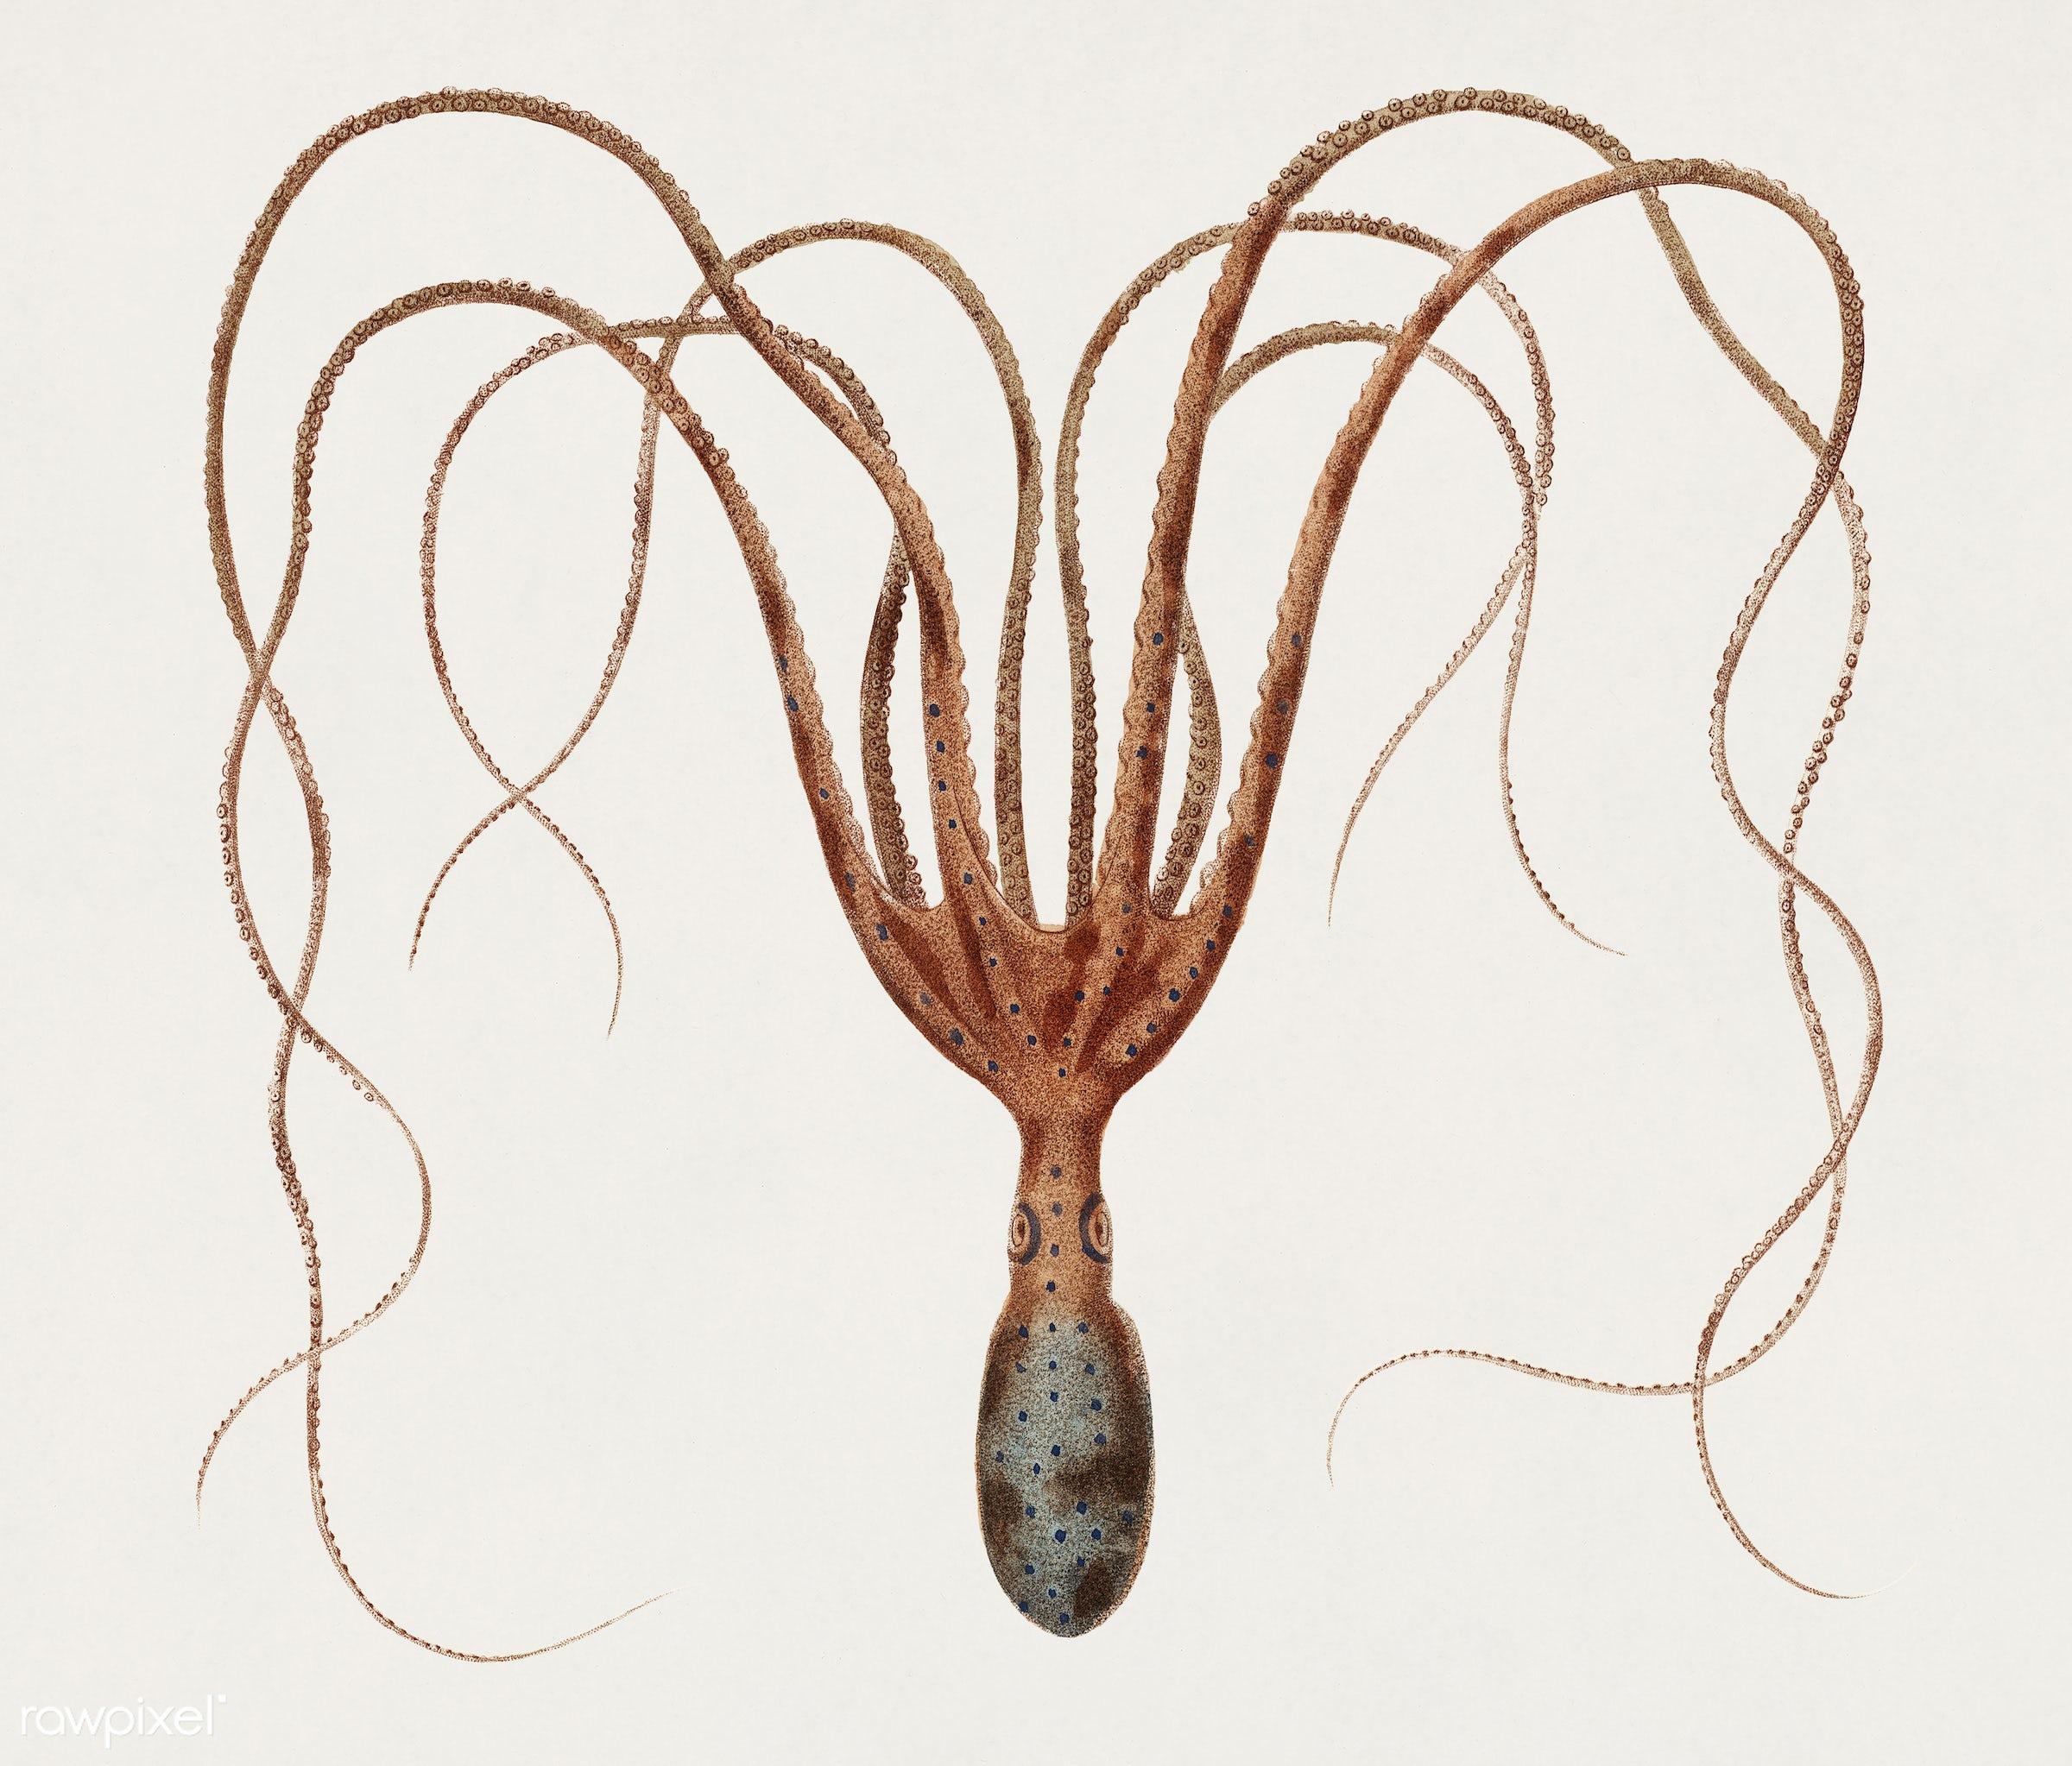 The common octopus (Octopus vulgaris) illustrated by Charles Dessalines D' Orbigny (1806-1876). Digitally enhanced from...